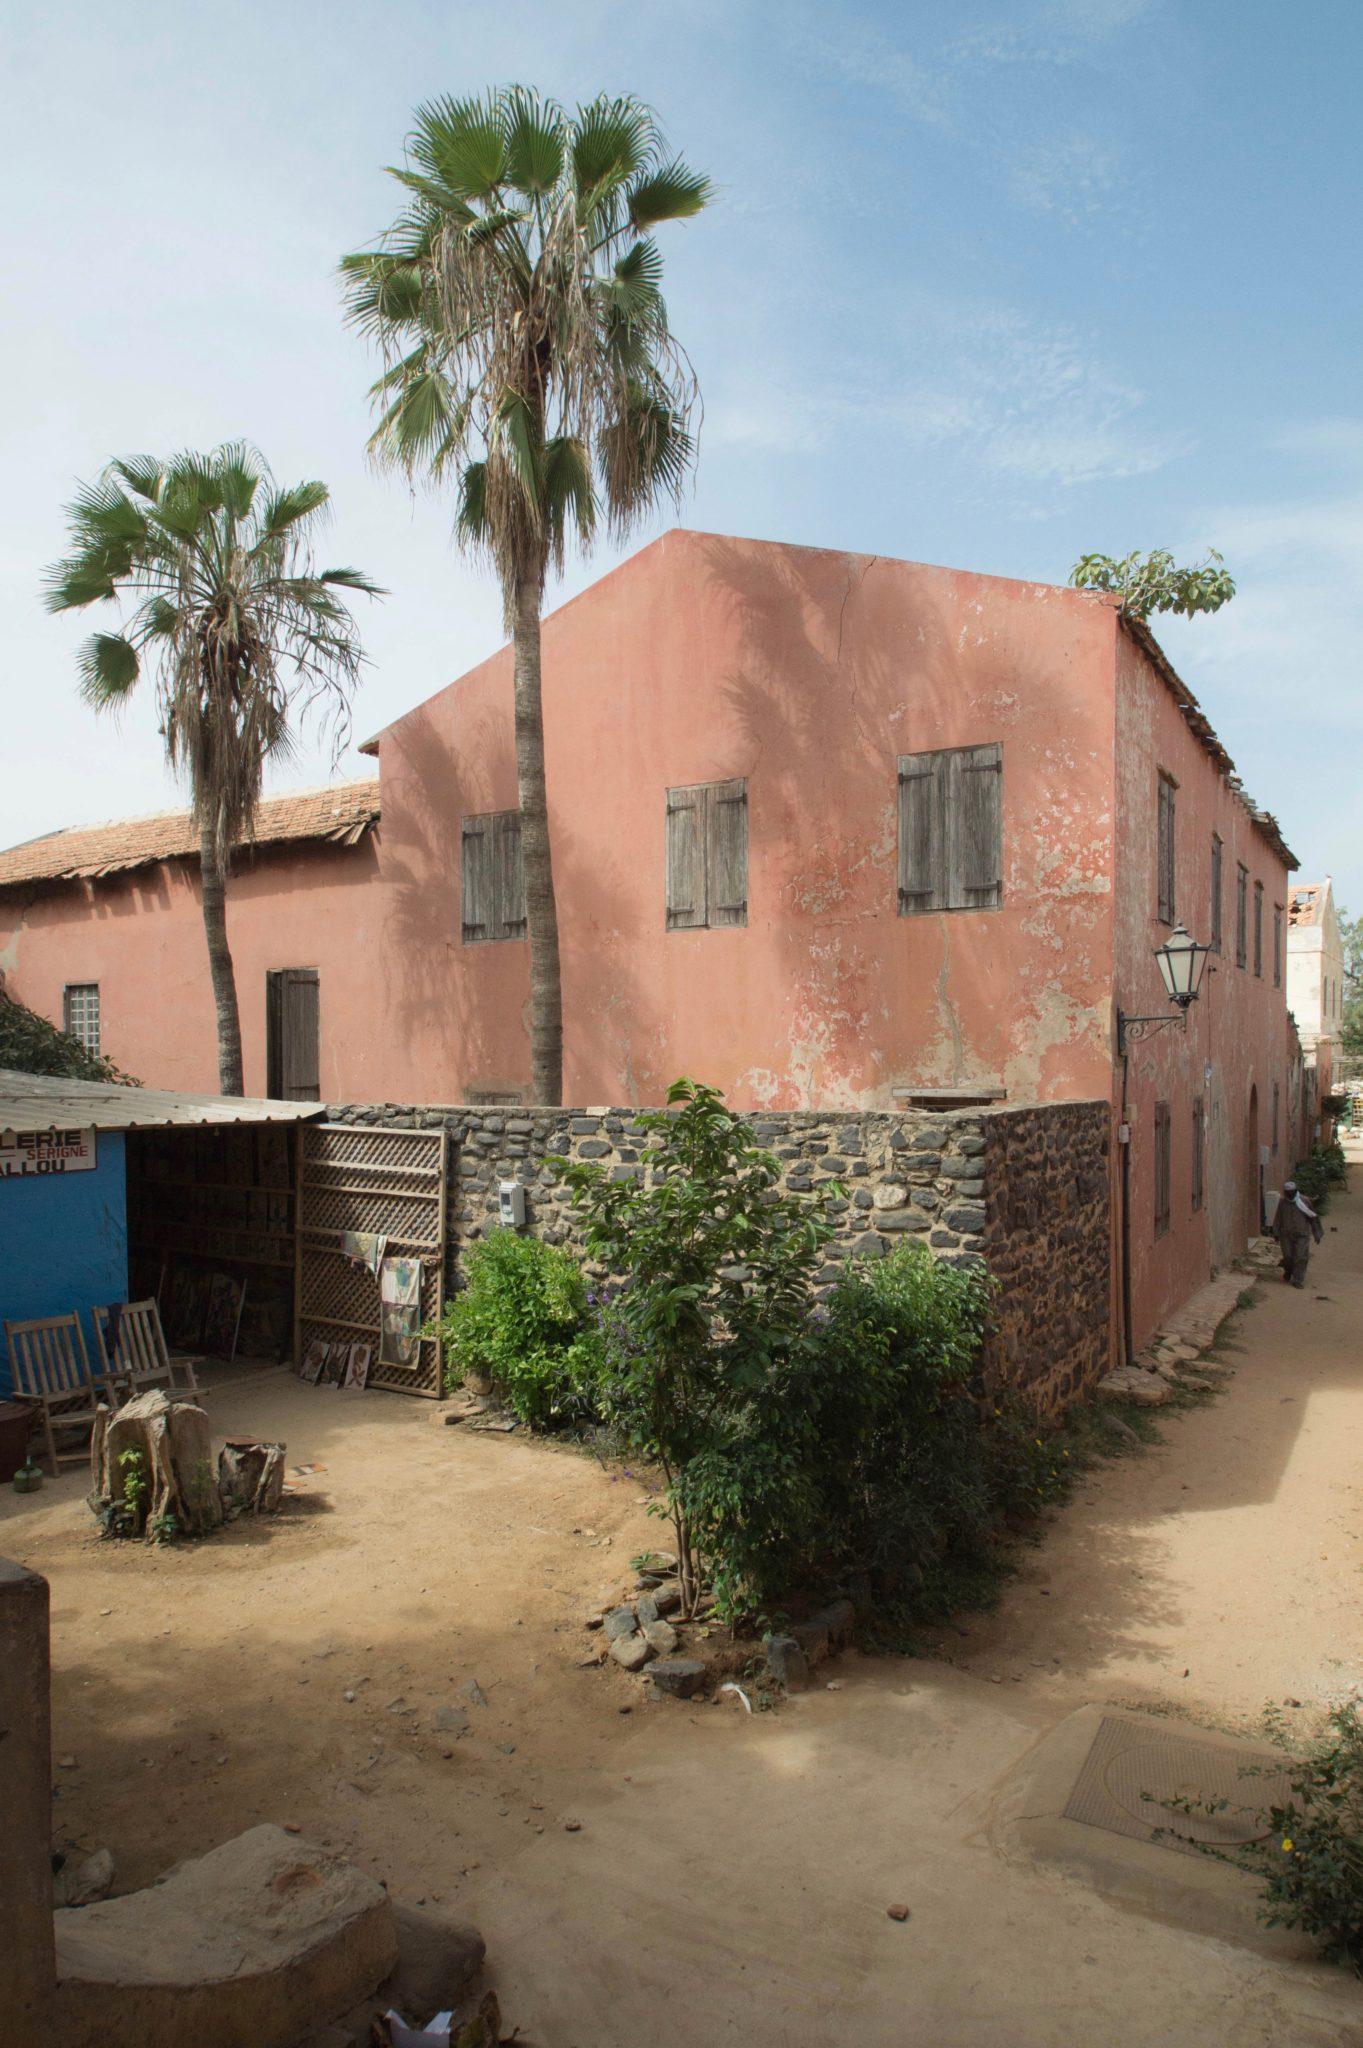 Senegal-Sehenswuerdigkeiten-Ile-de-Goree-Architektur